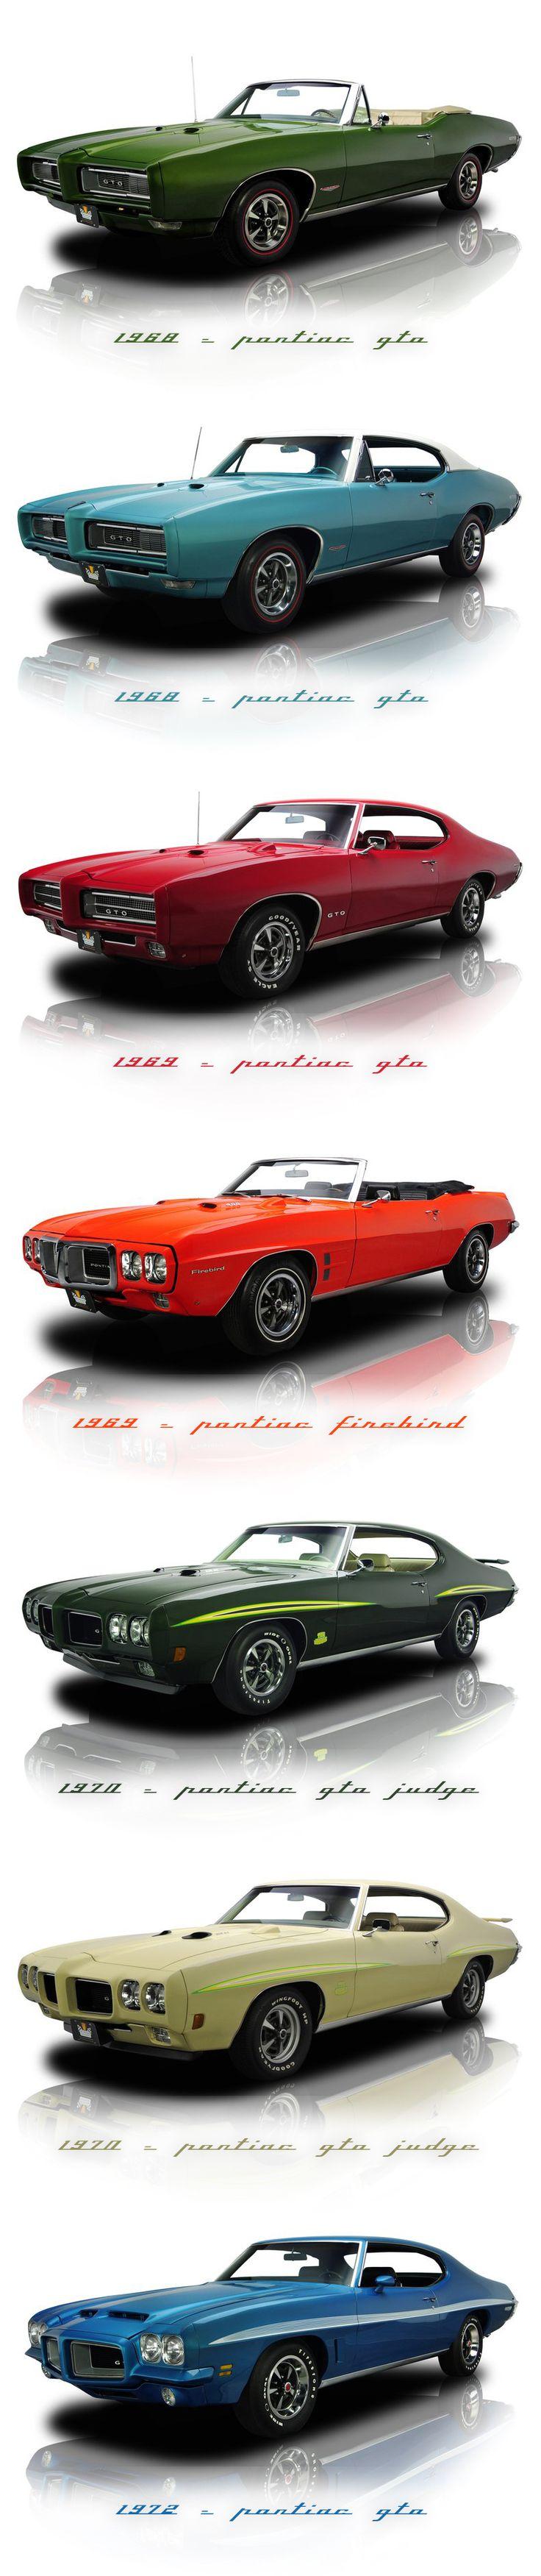 Pontiacs 1960-1979.